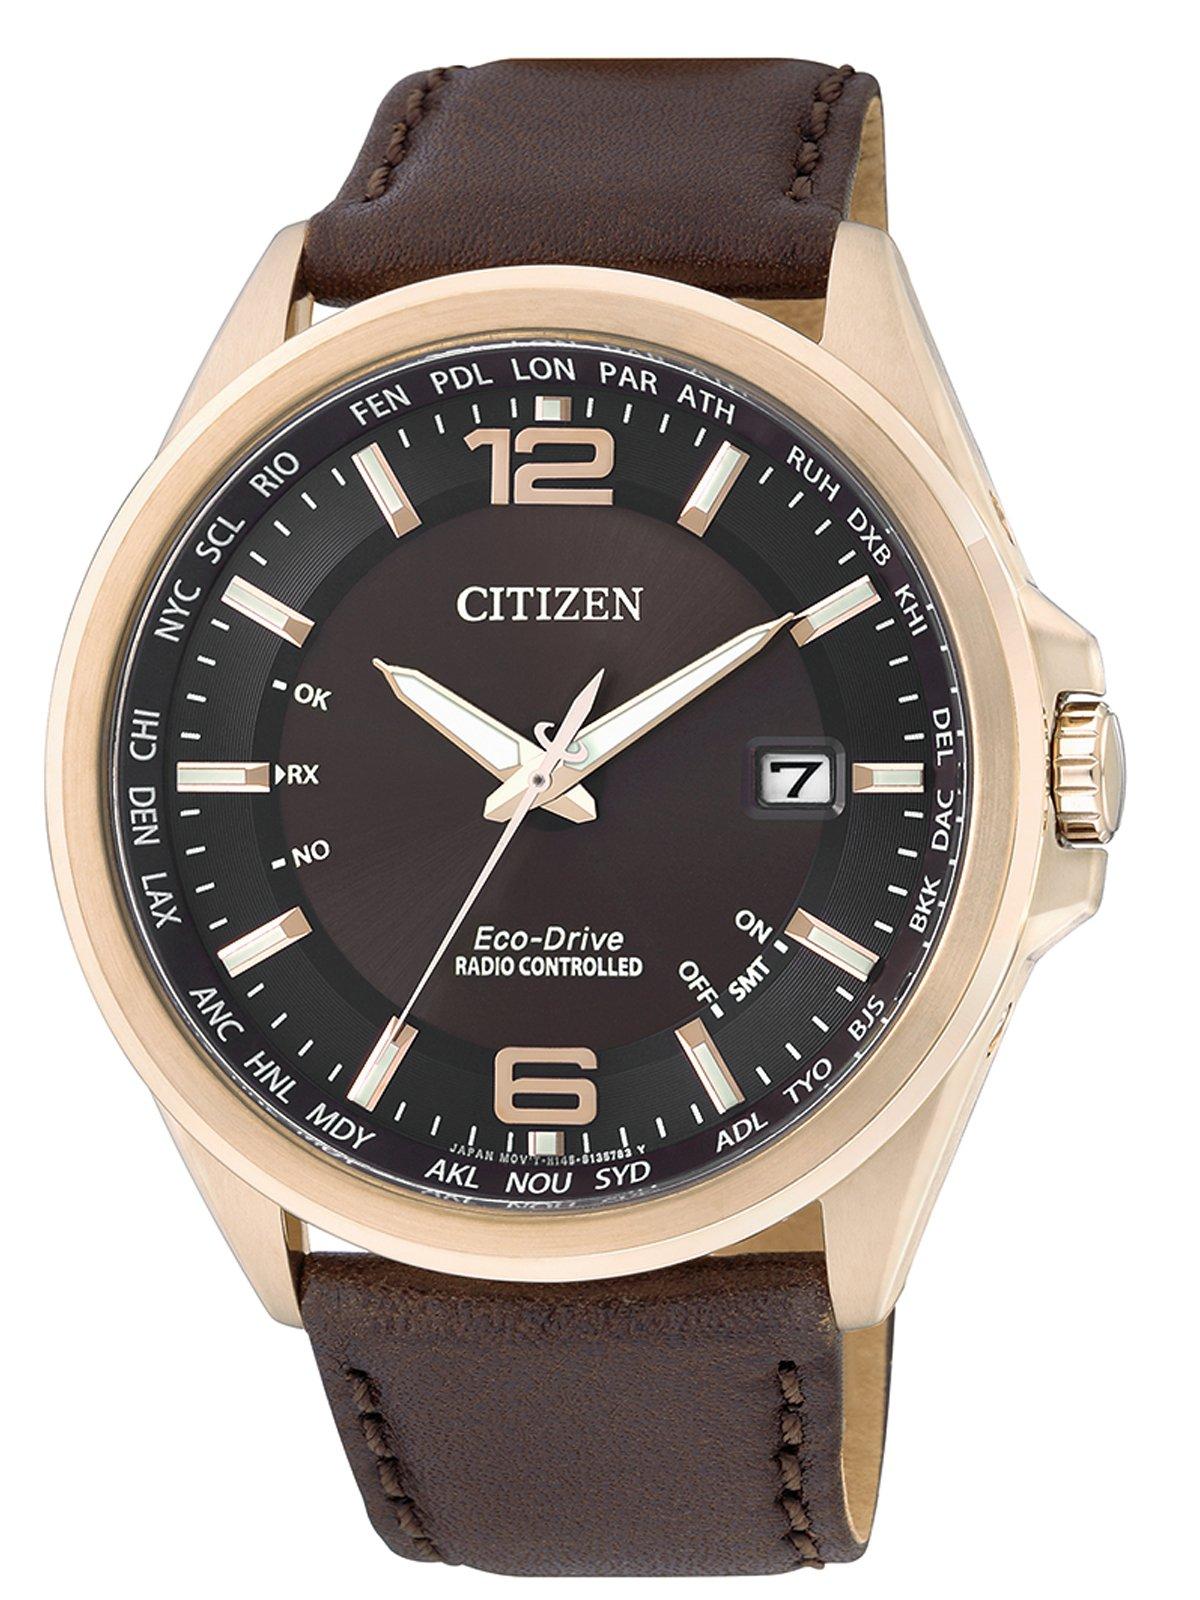 Citizen Funkuhren CB0017-03W – Reloj para hombres, correa de cuero color marrón